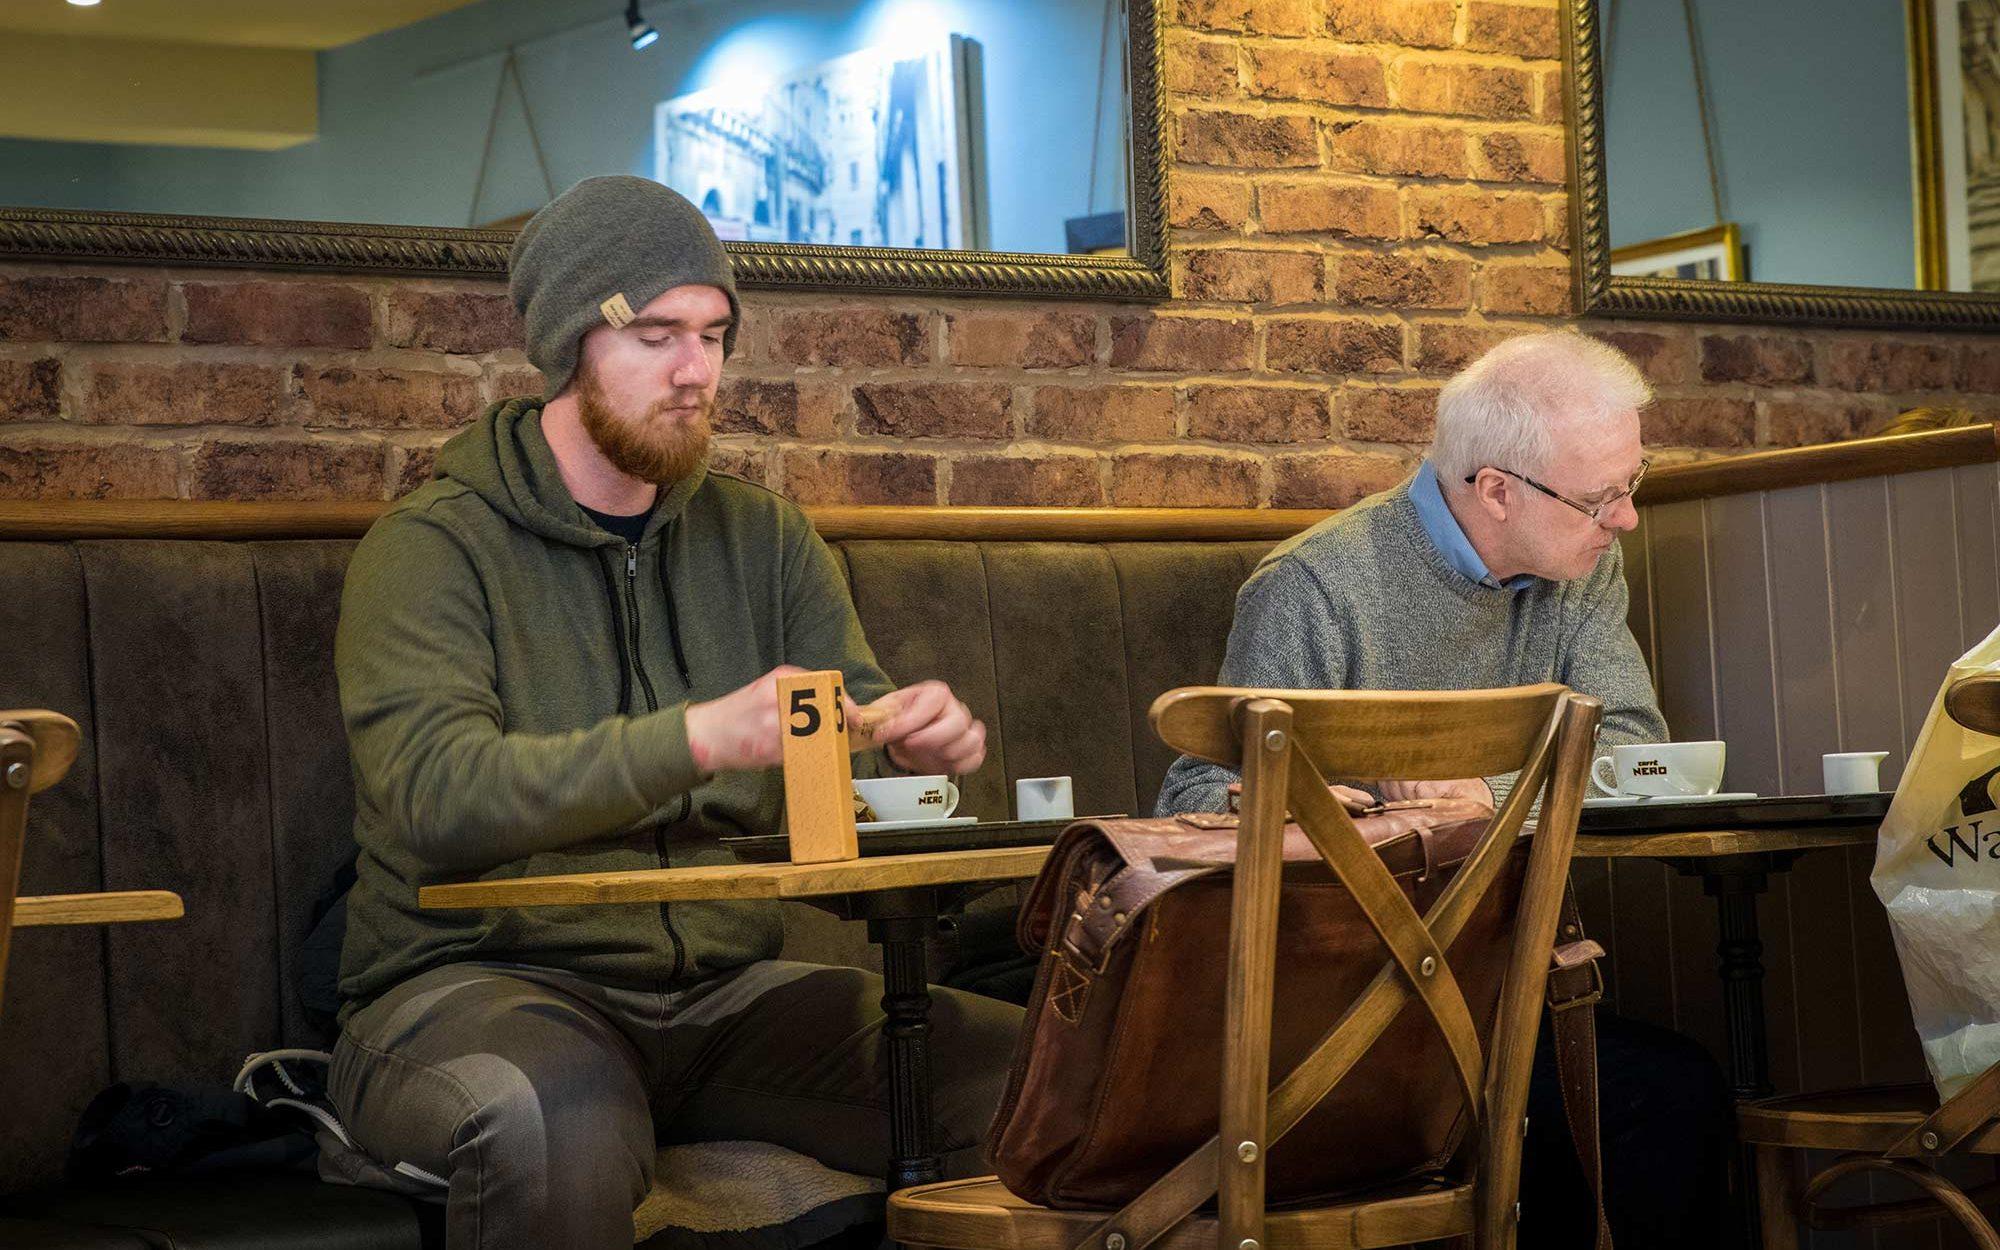 inverness coffee shop scotland roadtrip siredwards